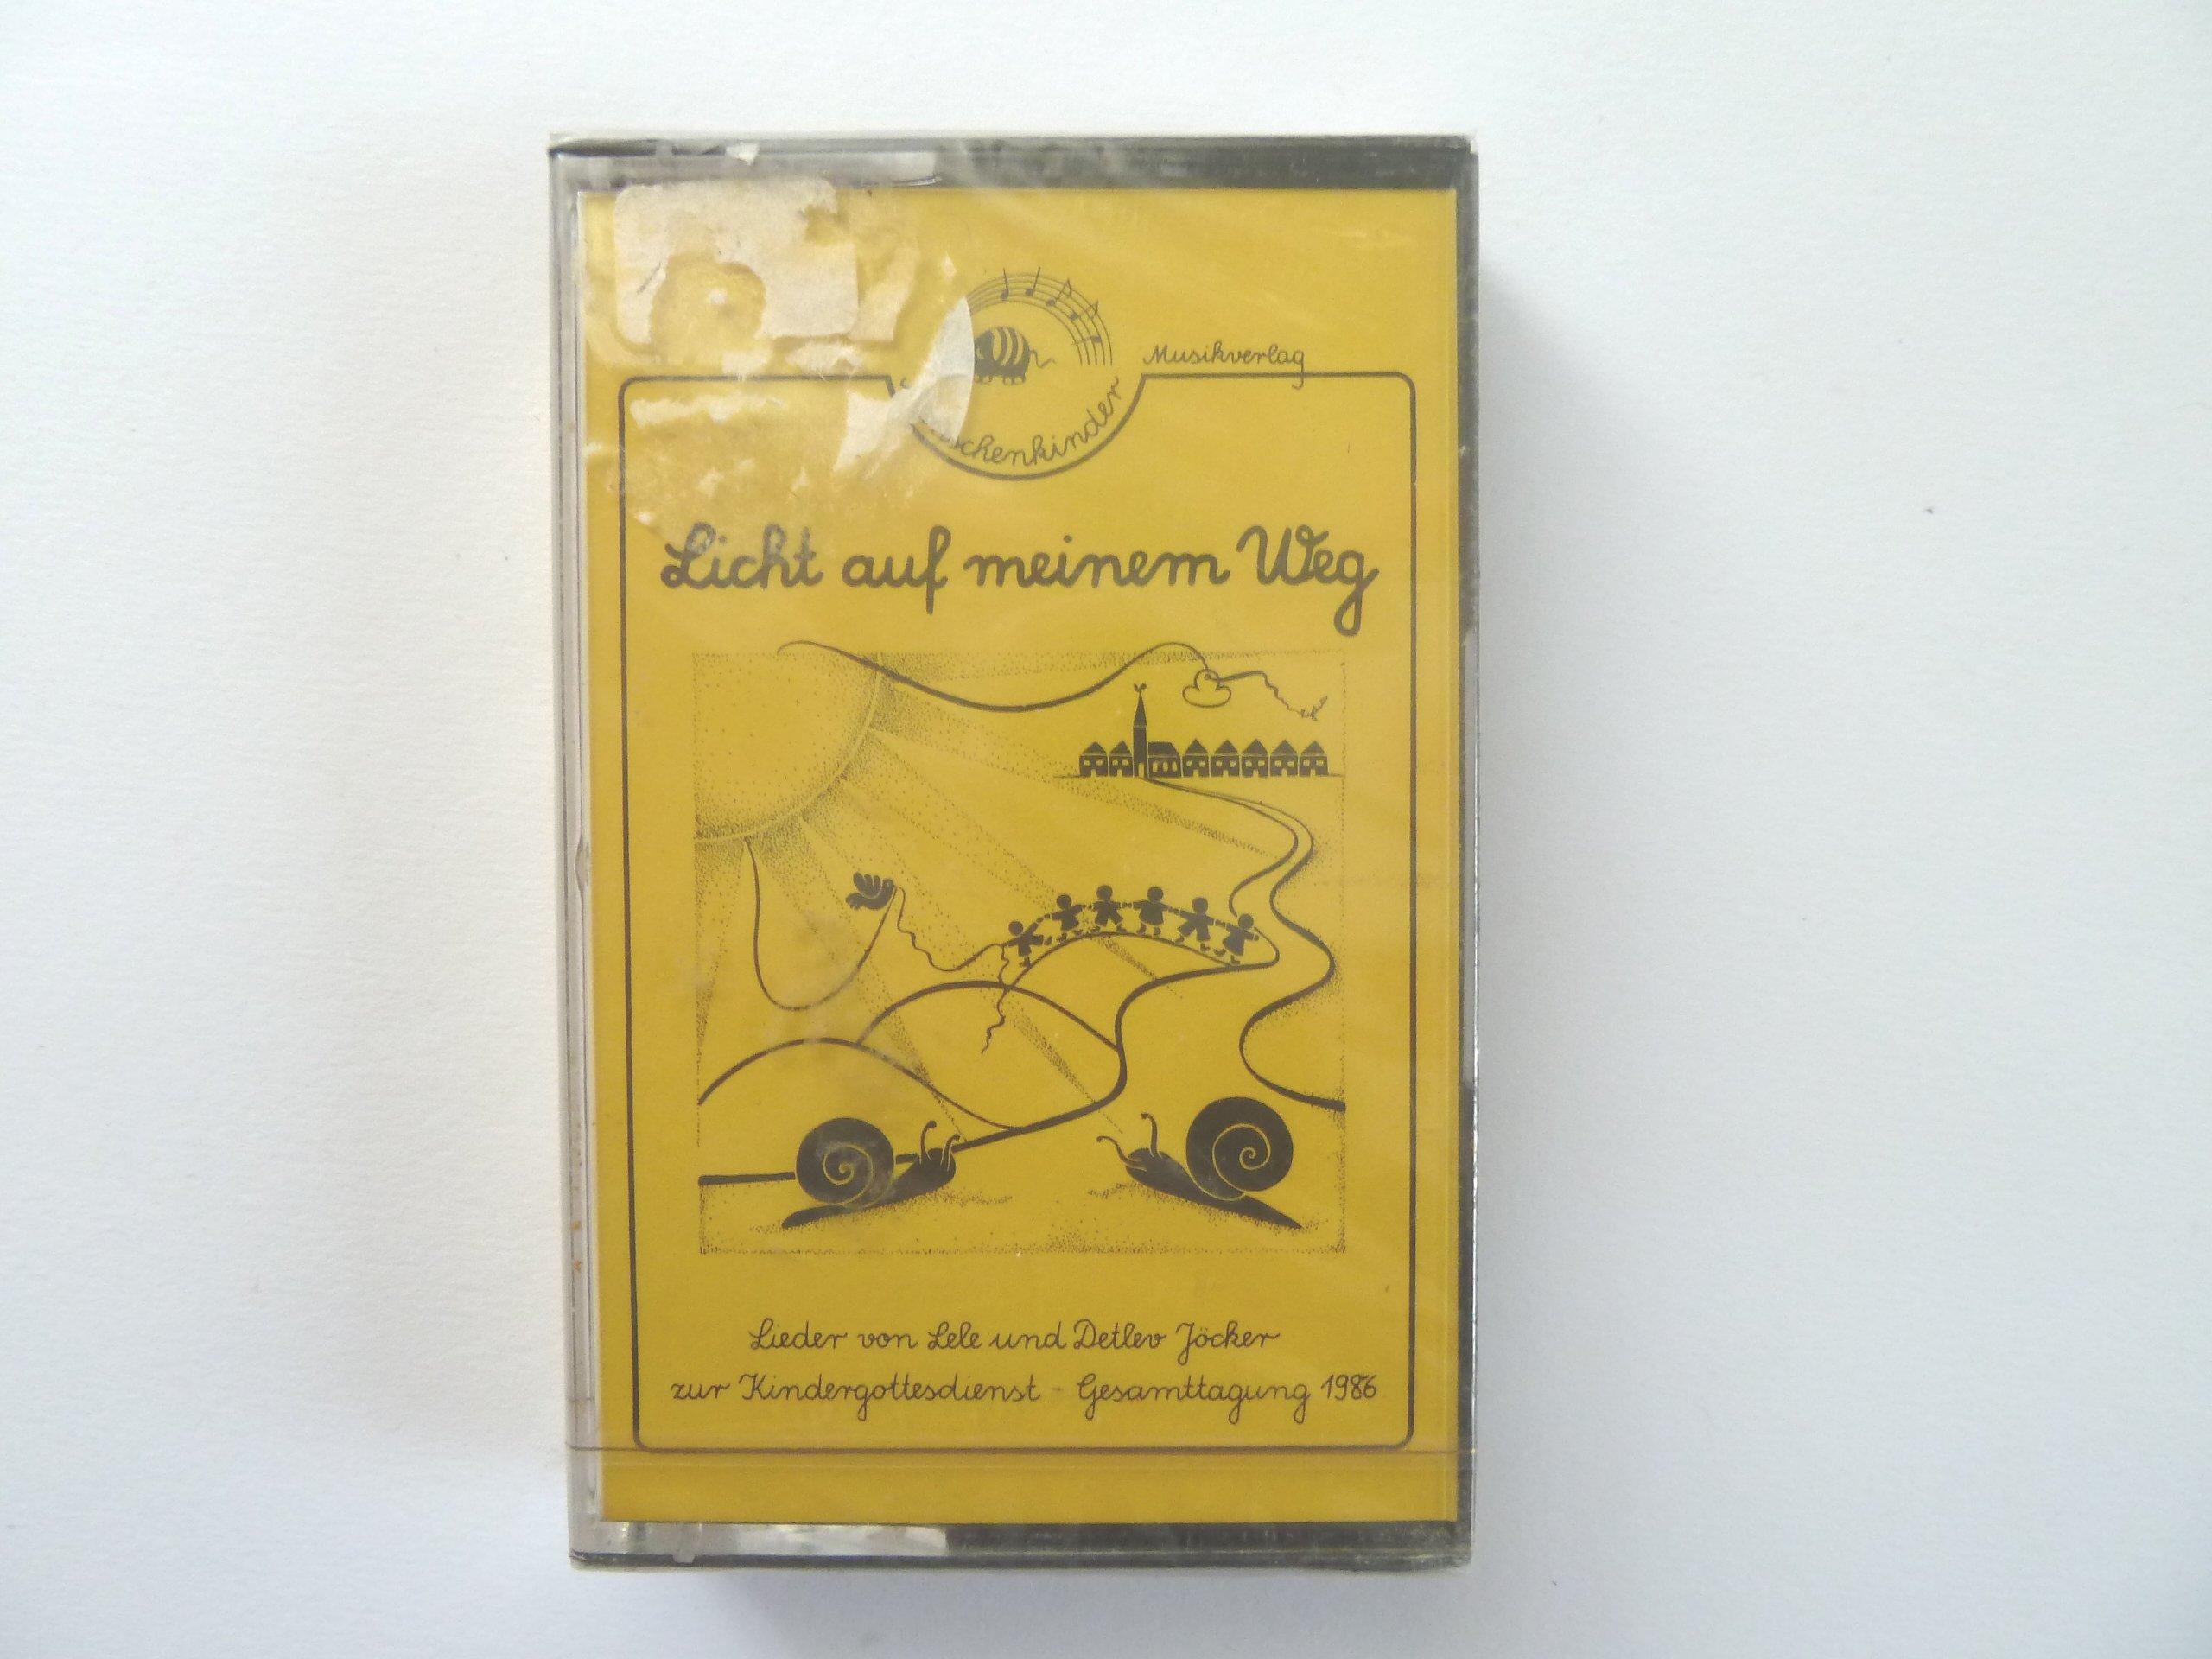 Licht auf meinem Weg, 1 Cassette Hörkassette – Audiobook, 1986 Detlev Jöcker Lele Jöcker Menschenkinder 3927497150